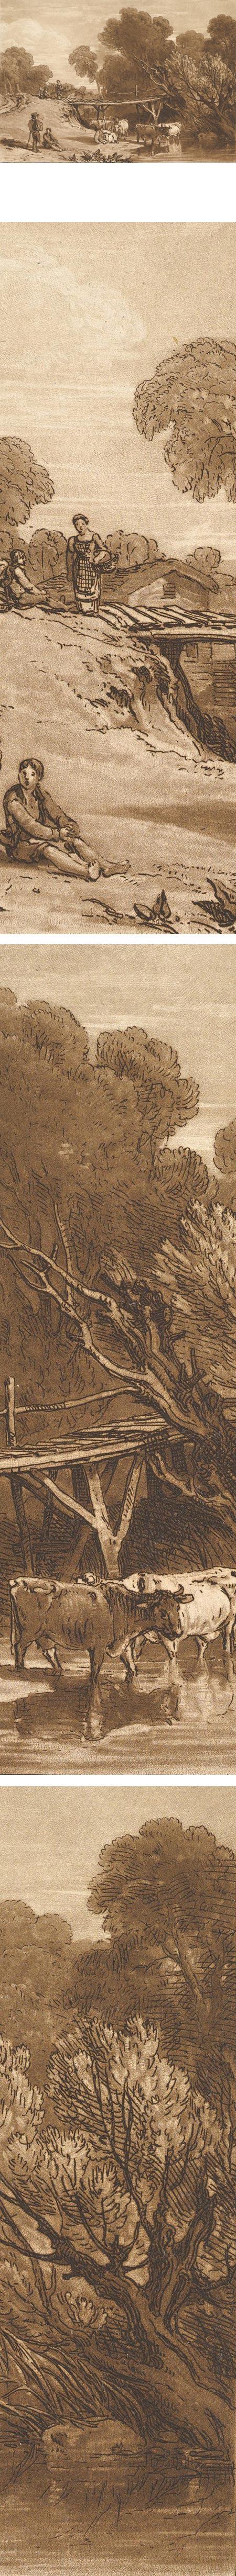 Bridge and Cows (Liber Studiorum, part I, plate 2), Joseph Mallord William Turner